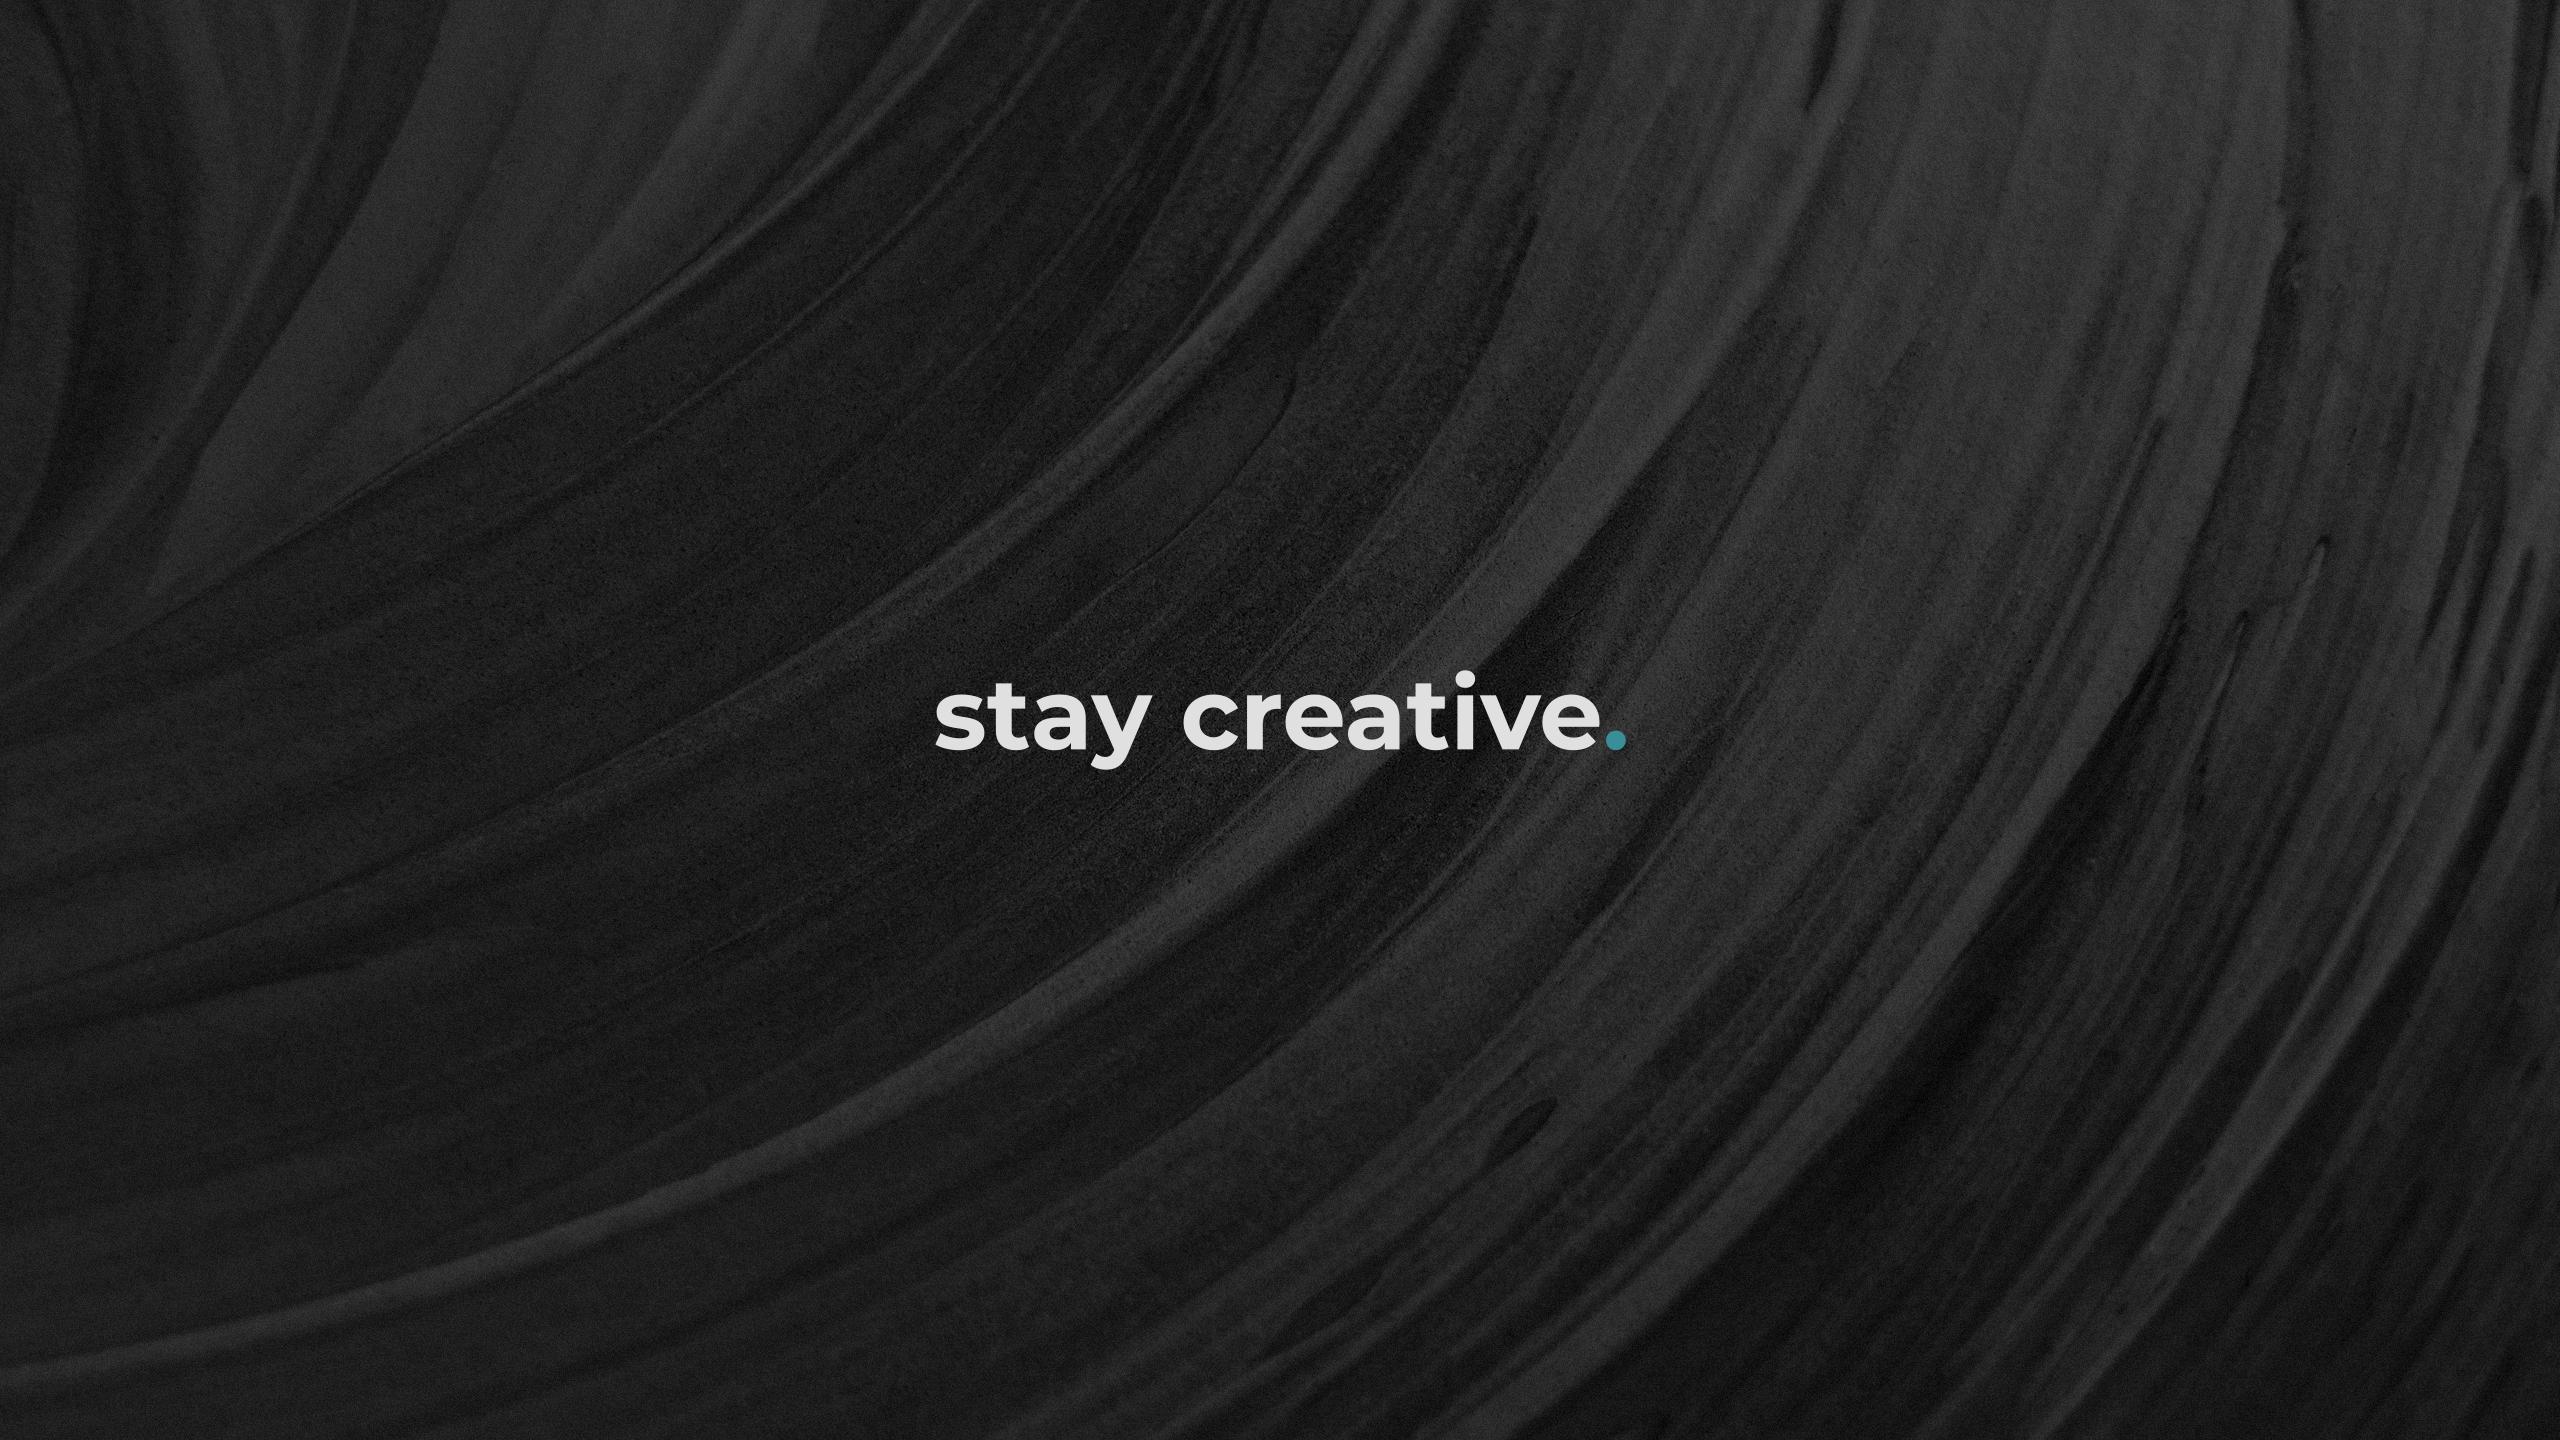 Stay Creative Wallpaper Remington Creative